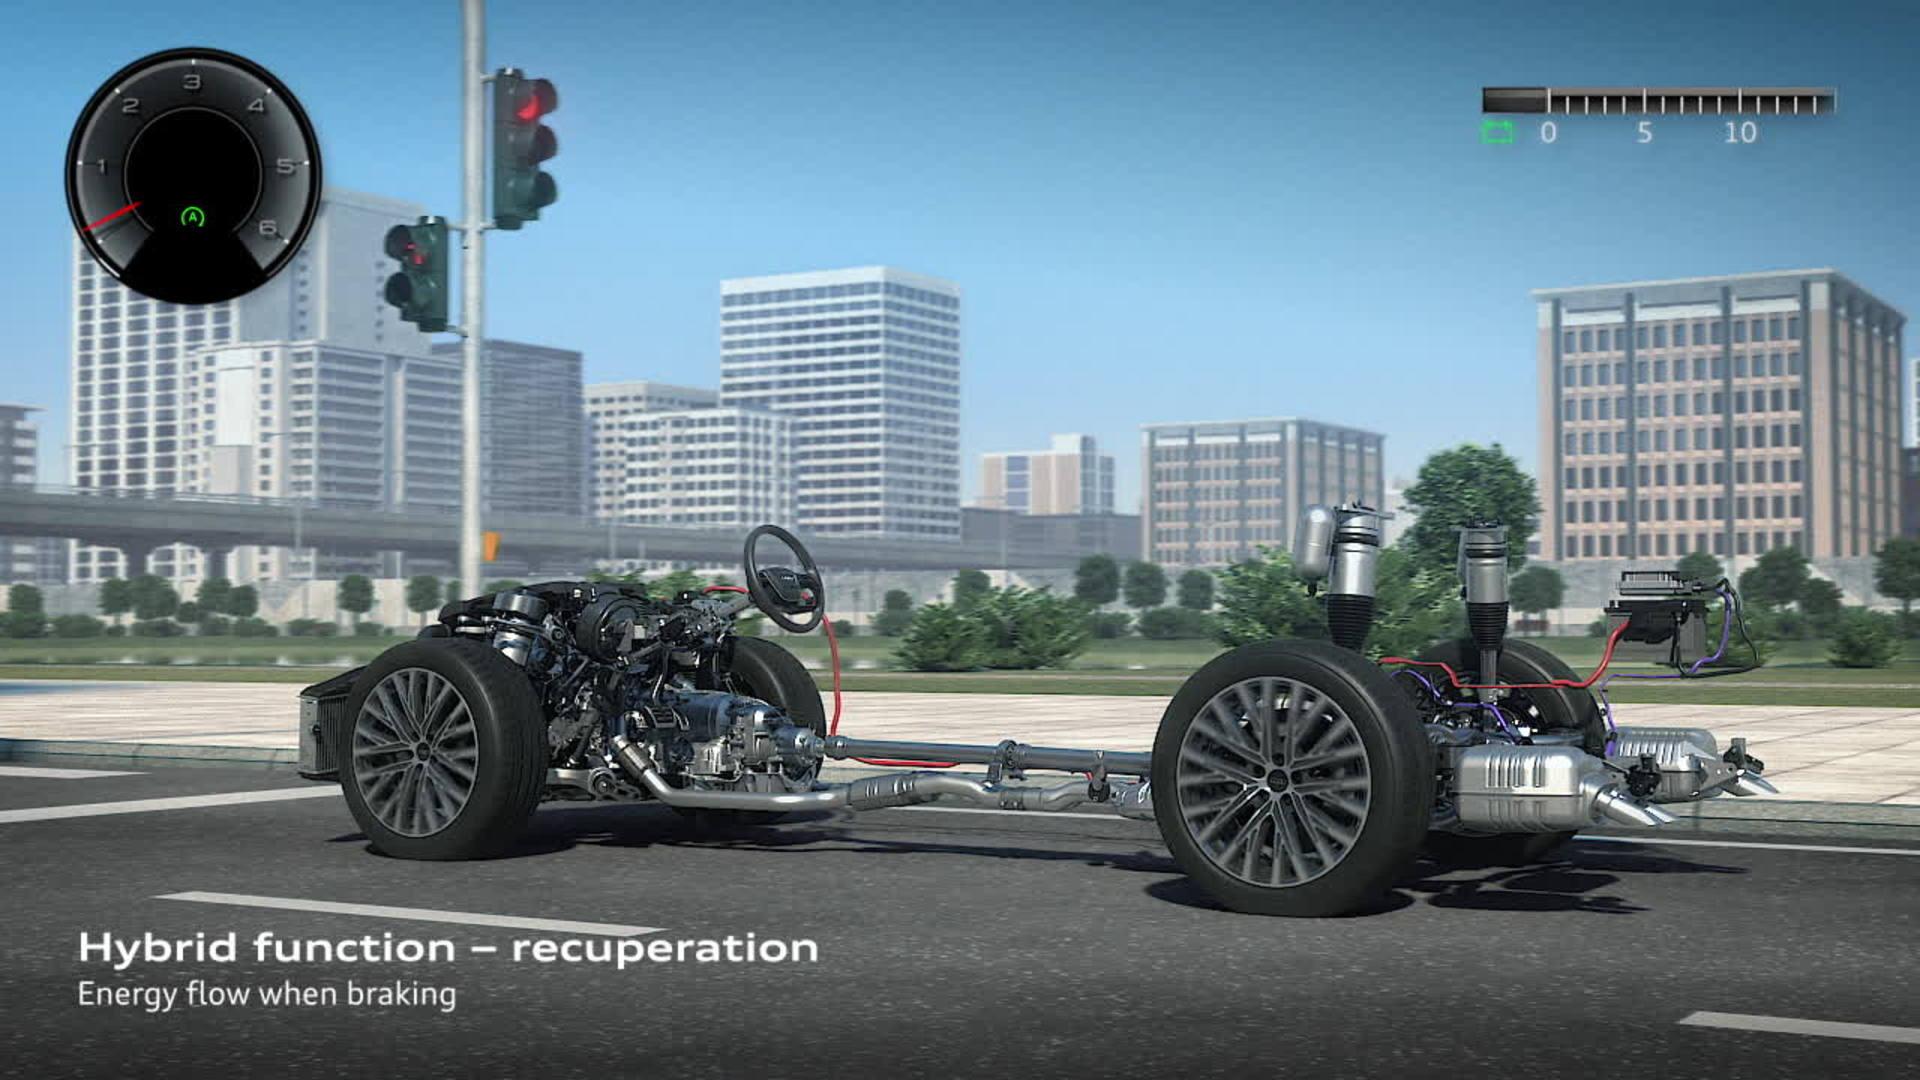 Drive System Audi Mediacenter Trail 70 12v Wiring Diagram A8 Mild Hybrid Electric Vehicle Mhev Animation